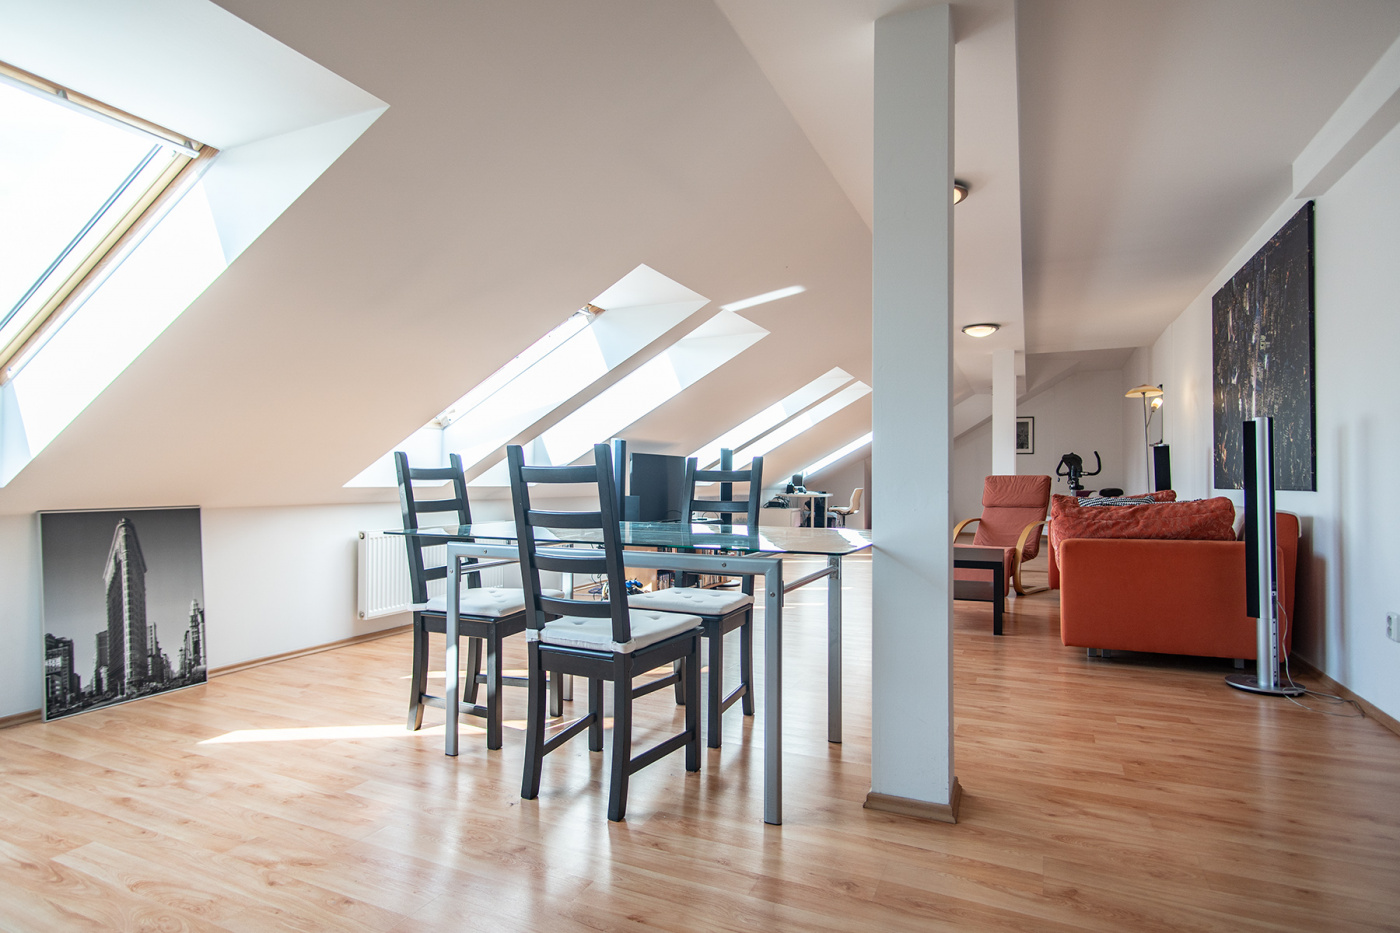 Půdní byt 3+kk, plocha 139 m², ulice Táborská, Praha 4 - Nusle | 2